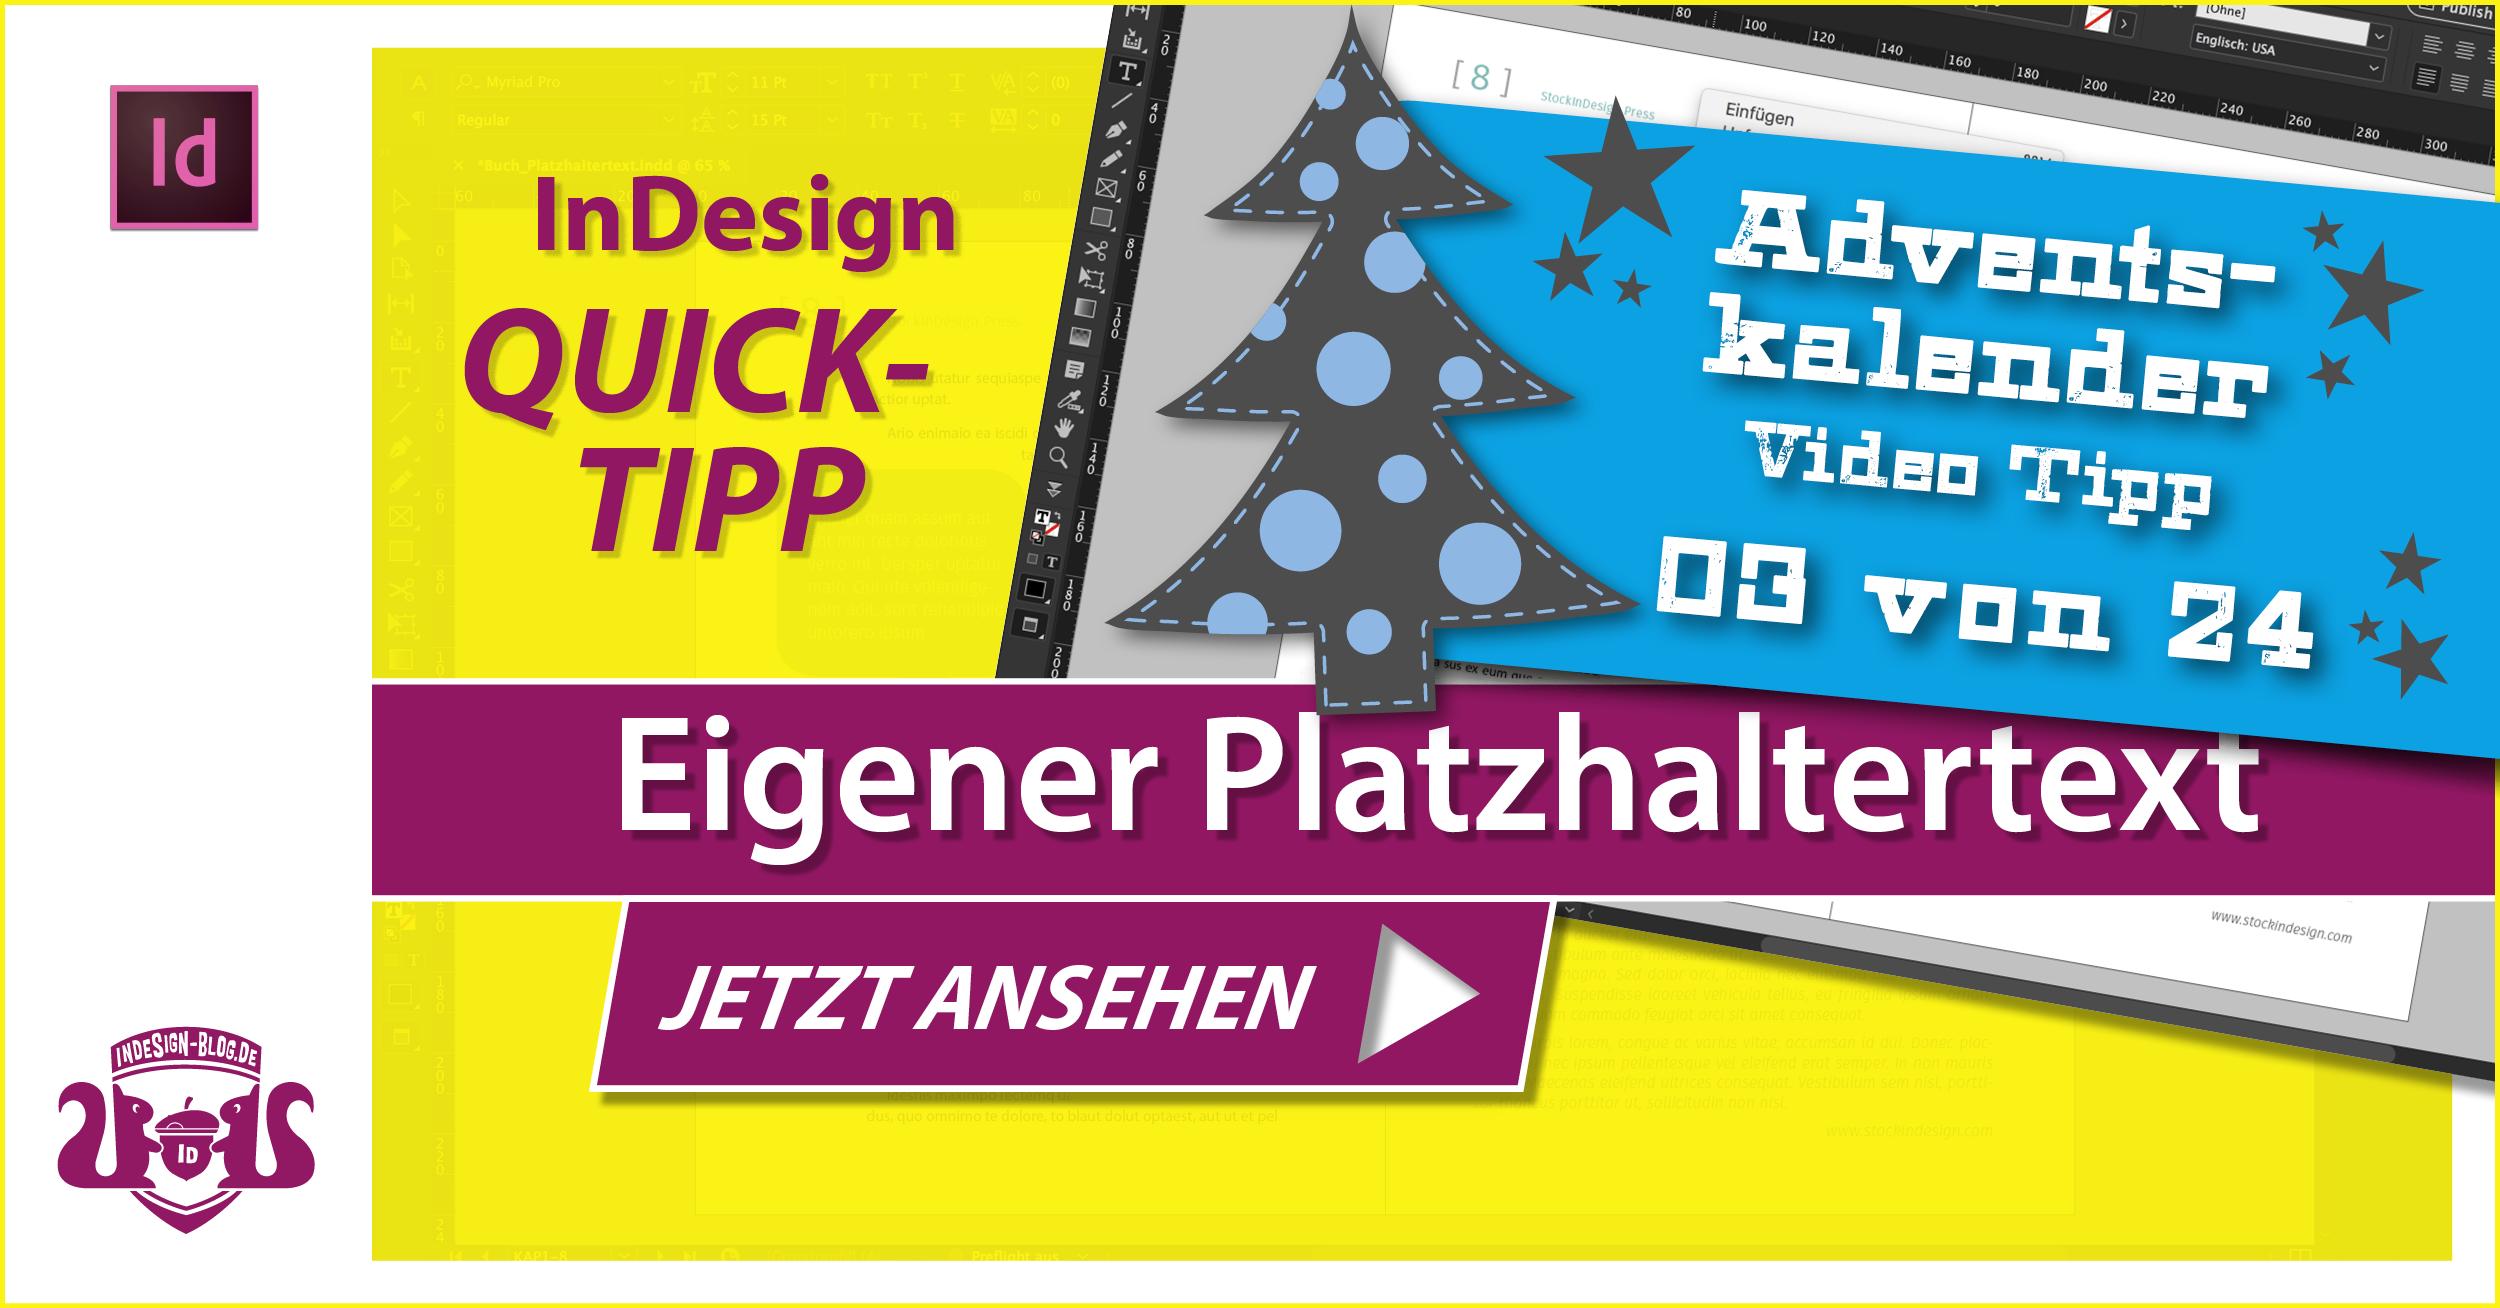 Thumbnail – Adventskalender Tipp Nr. 3 – Eigenen Platzhaltertext verwenden